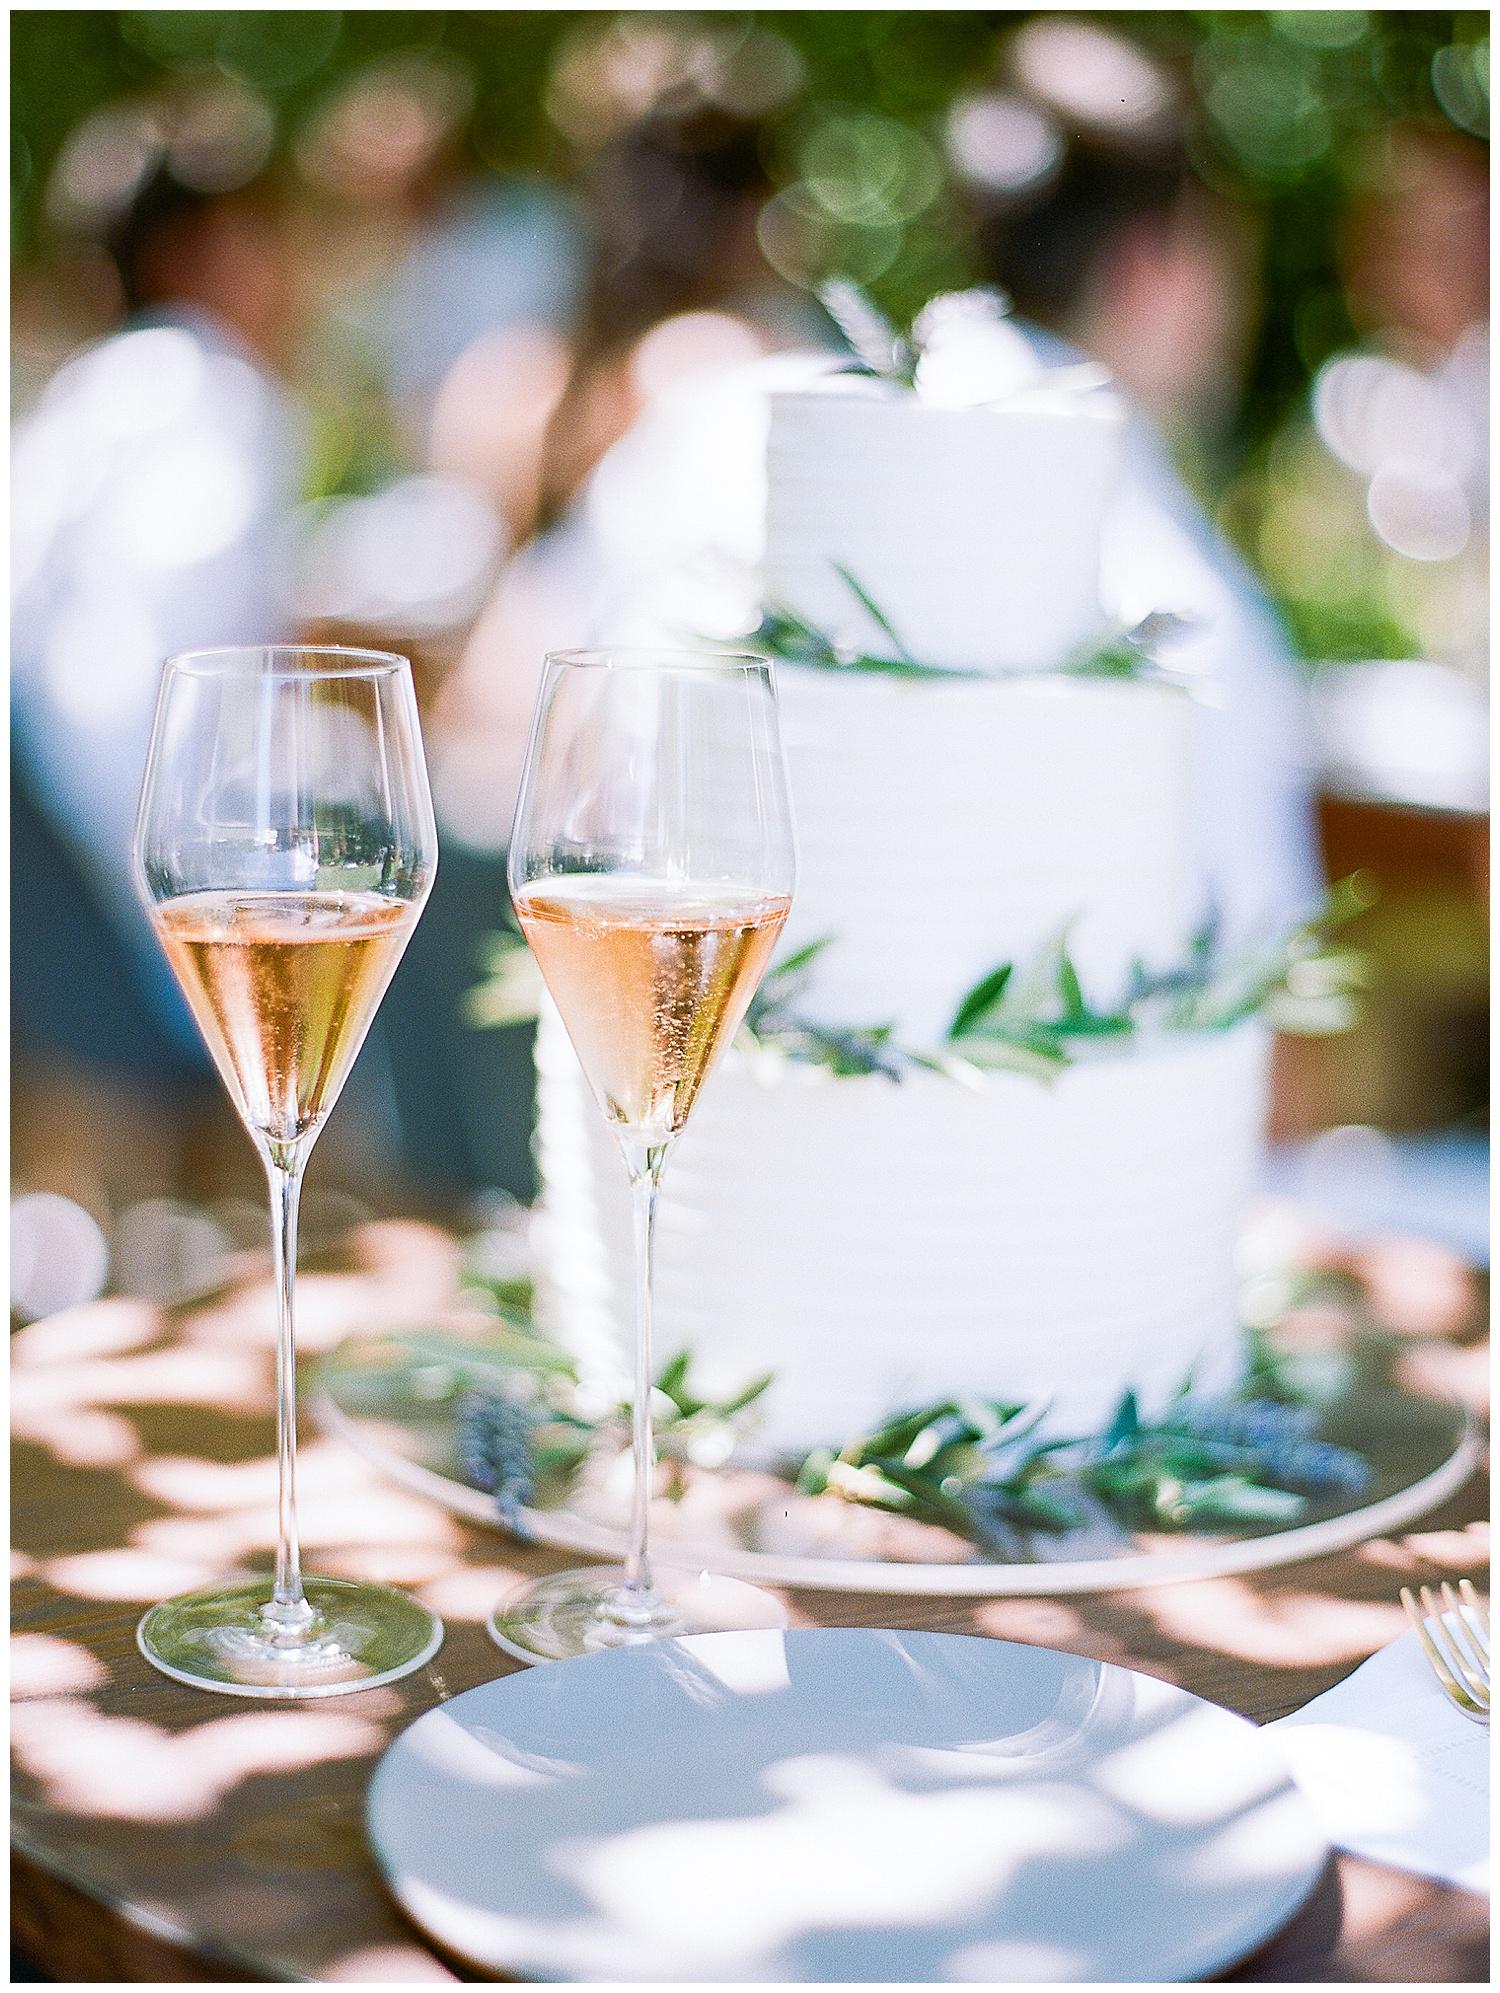 Janine_Licare_Photography_San_Francisco_Wedding_Photographer_Meadowood_Napa_Valley_Sonoma_0038.jpg